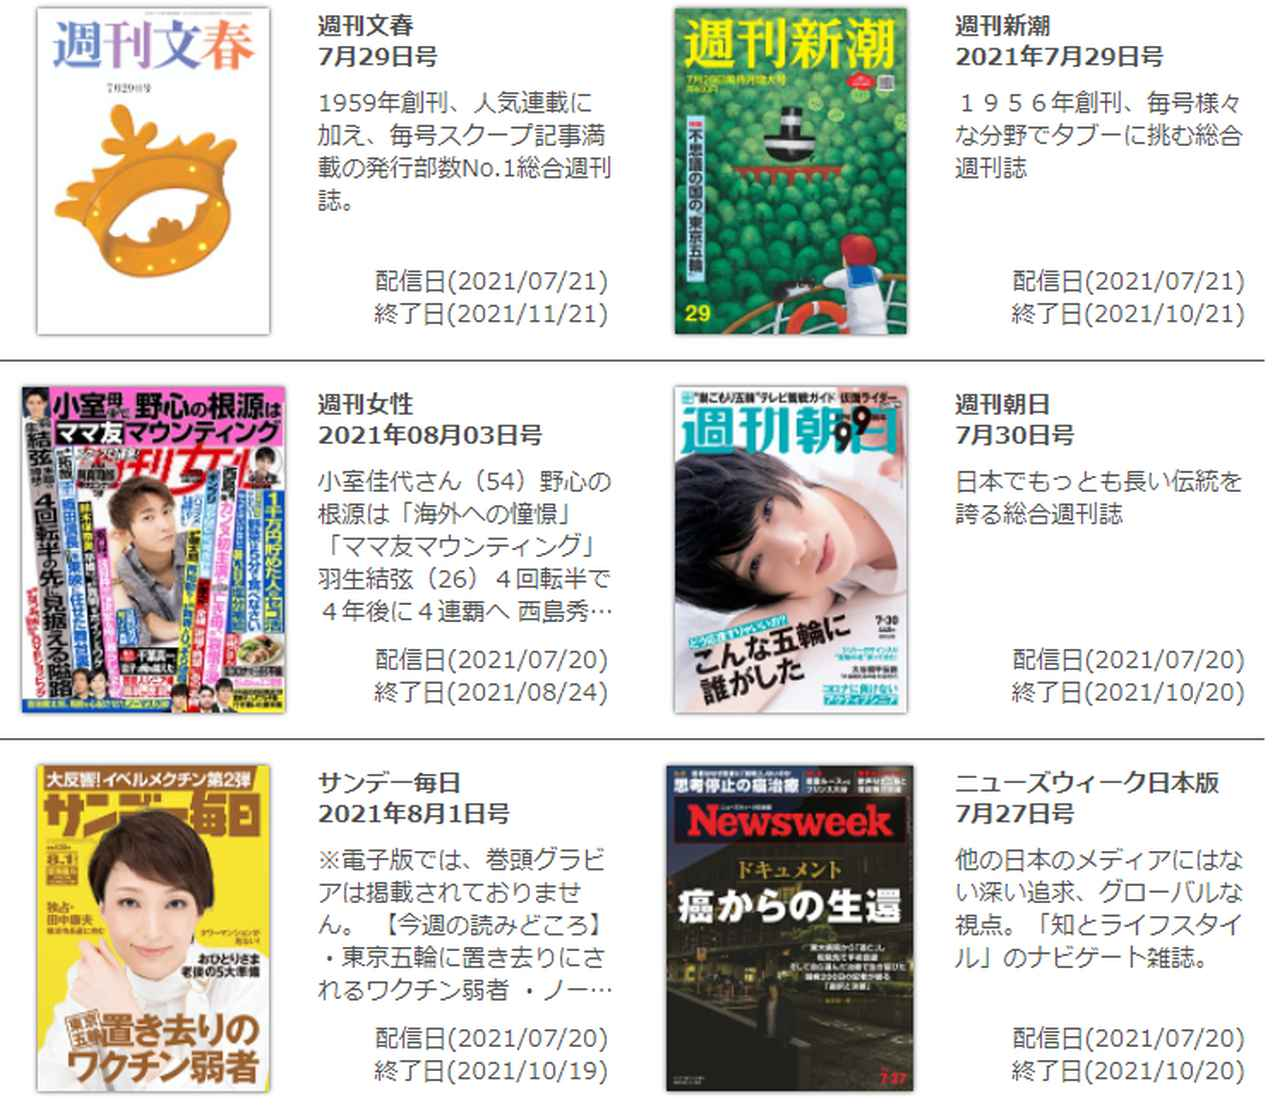 画像: magazine.dmkt-sp.jp